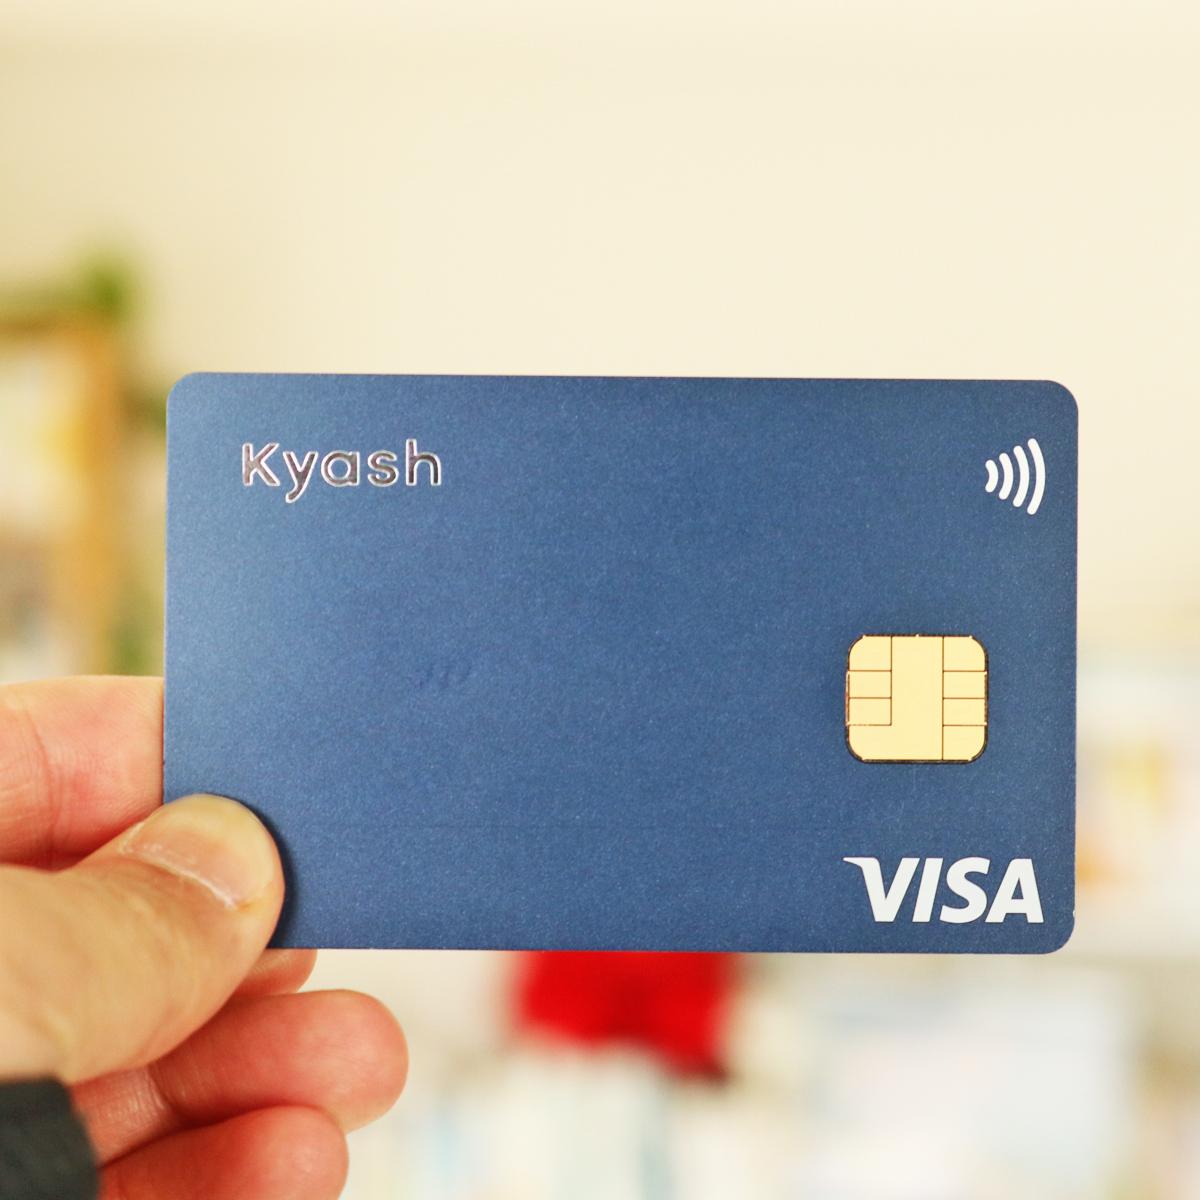 Kyashがタッチ決済対応のスタイリッシュな新カード発行! 気になる「お得度」は?